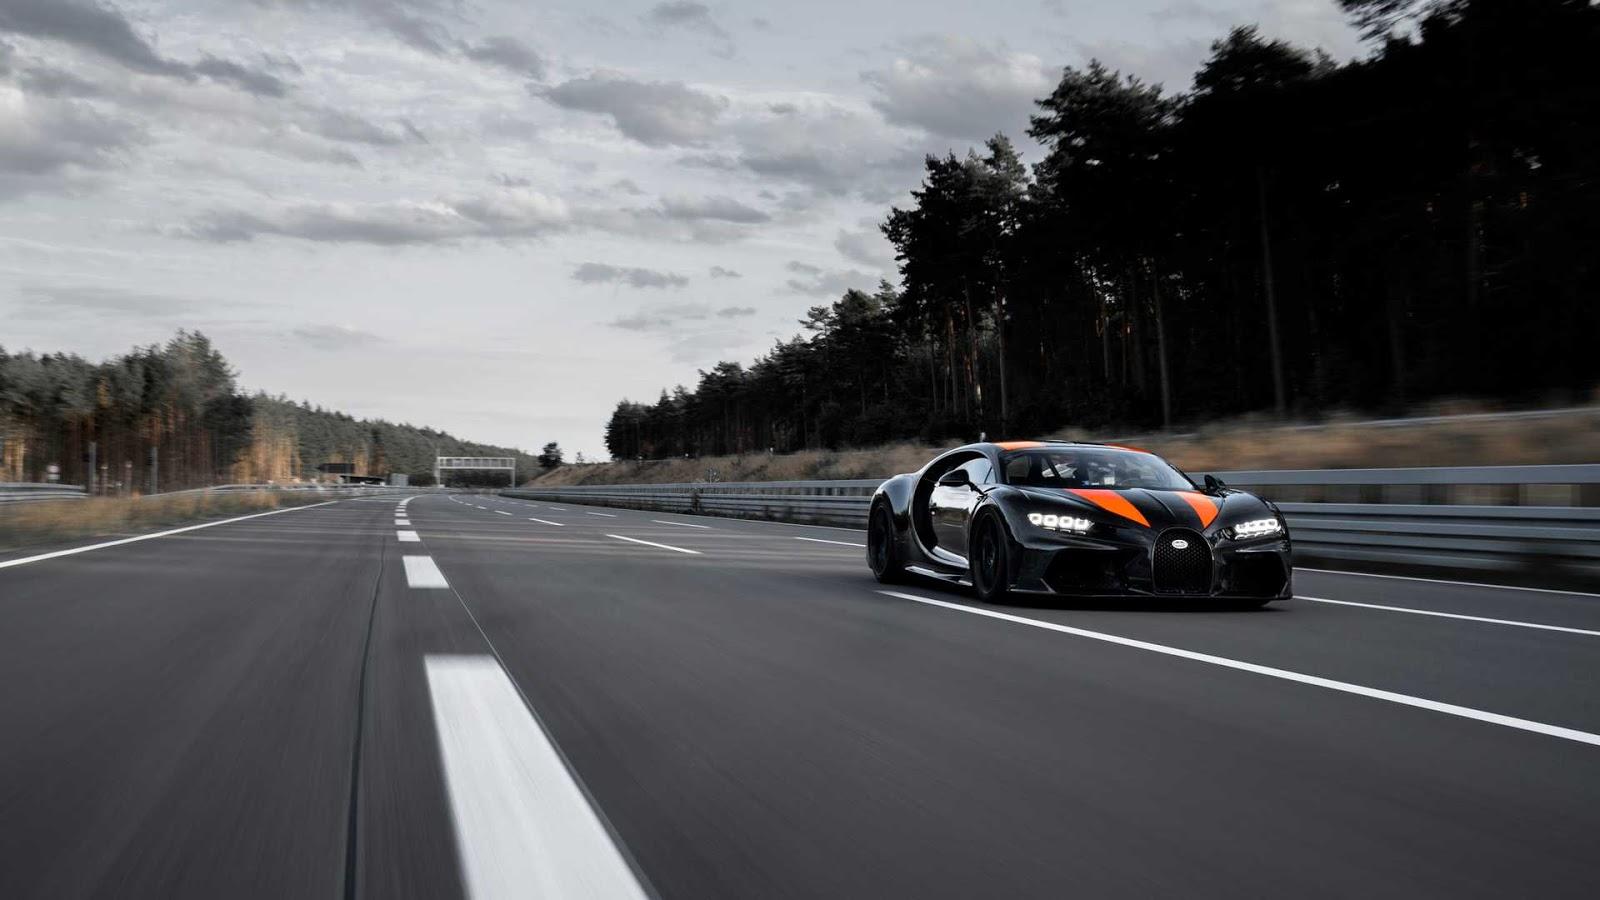 bugatti chiron sport built for top speed run Κυνηγώντας το μαγικό 500άρι